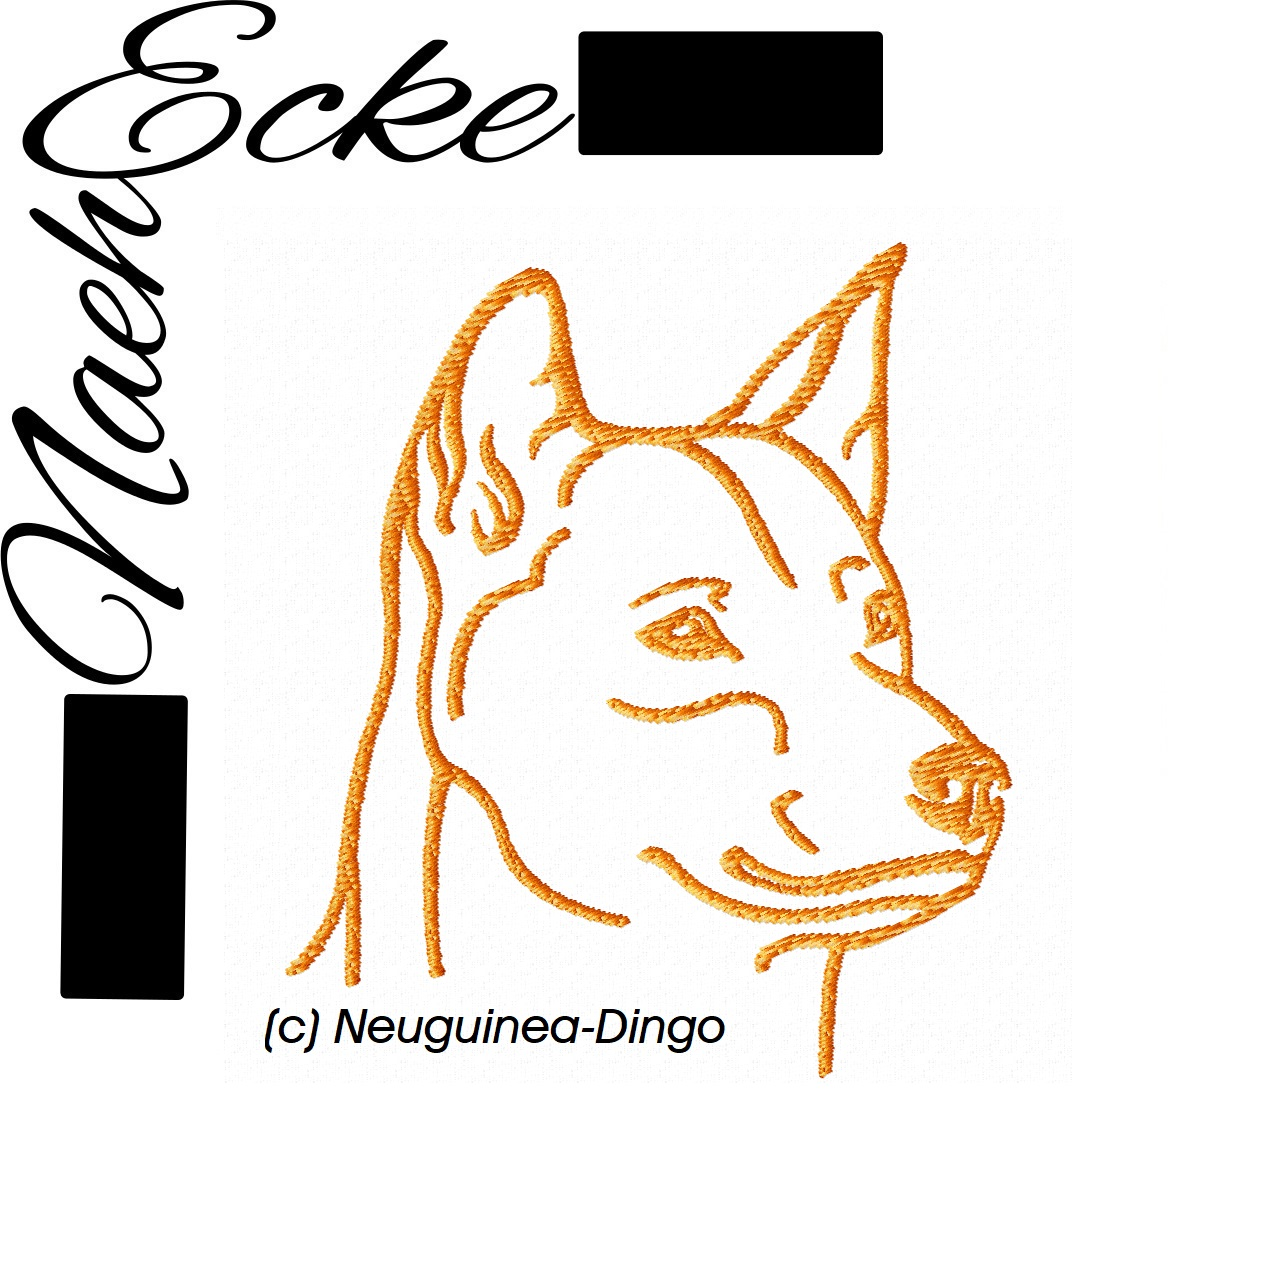 Neuguinea-Dingo